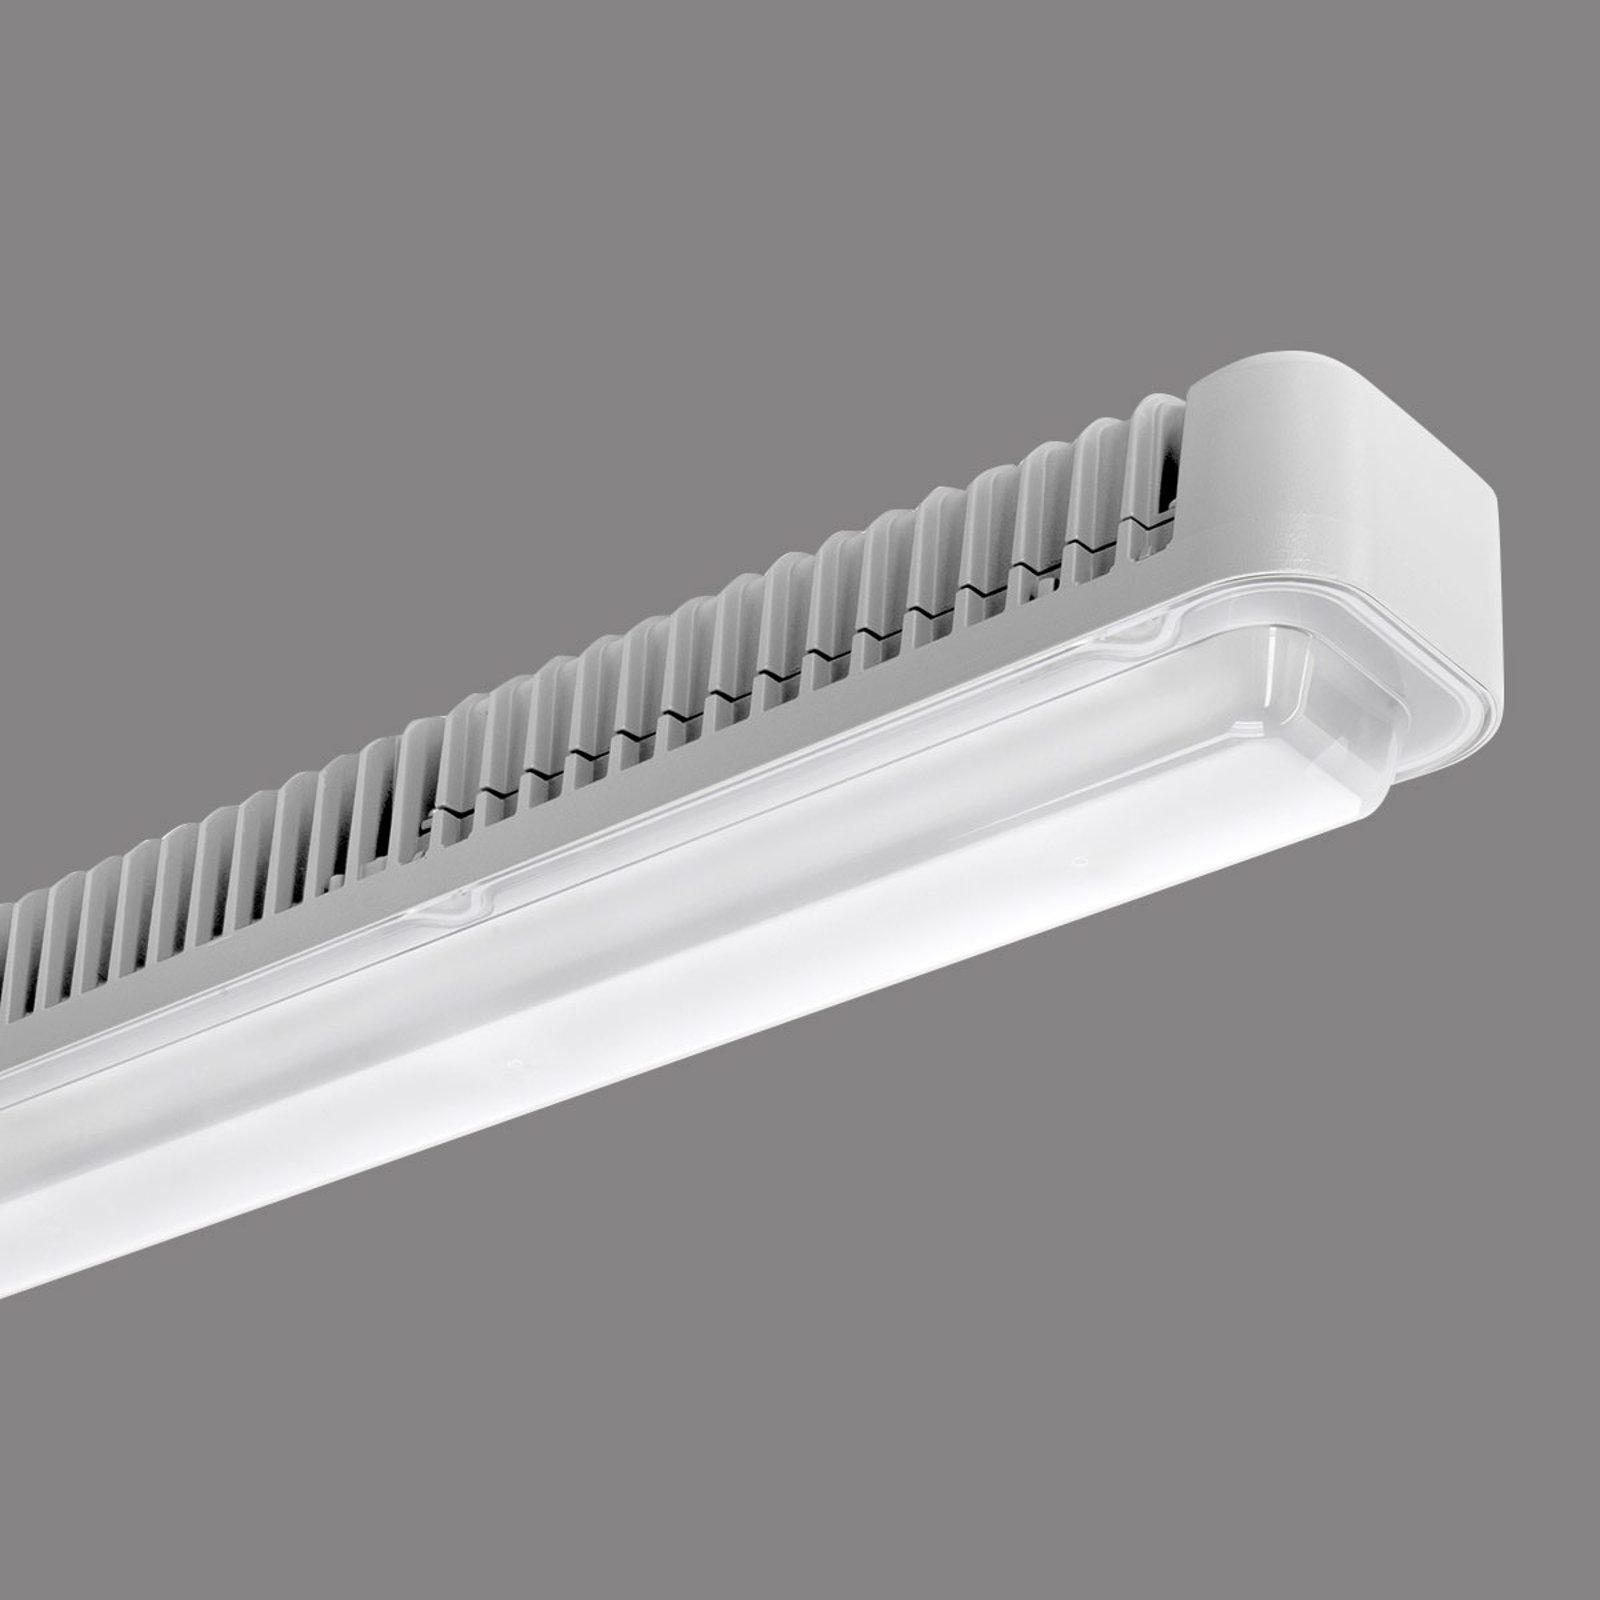 LED-taklampe Koa Line STR/PC S/EW 56W